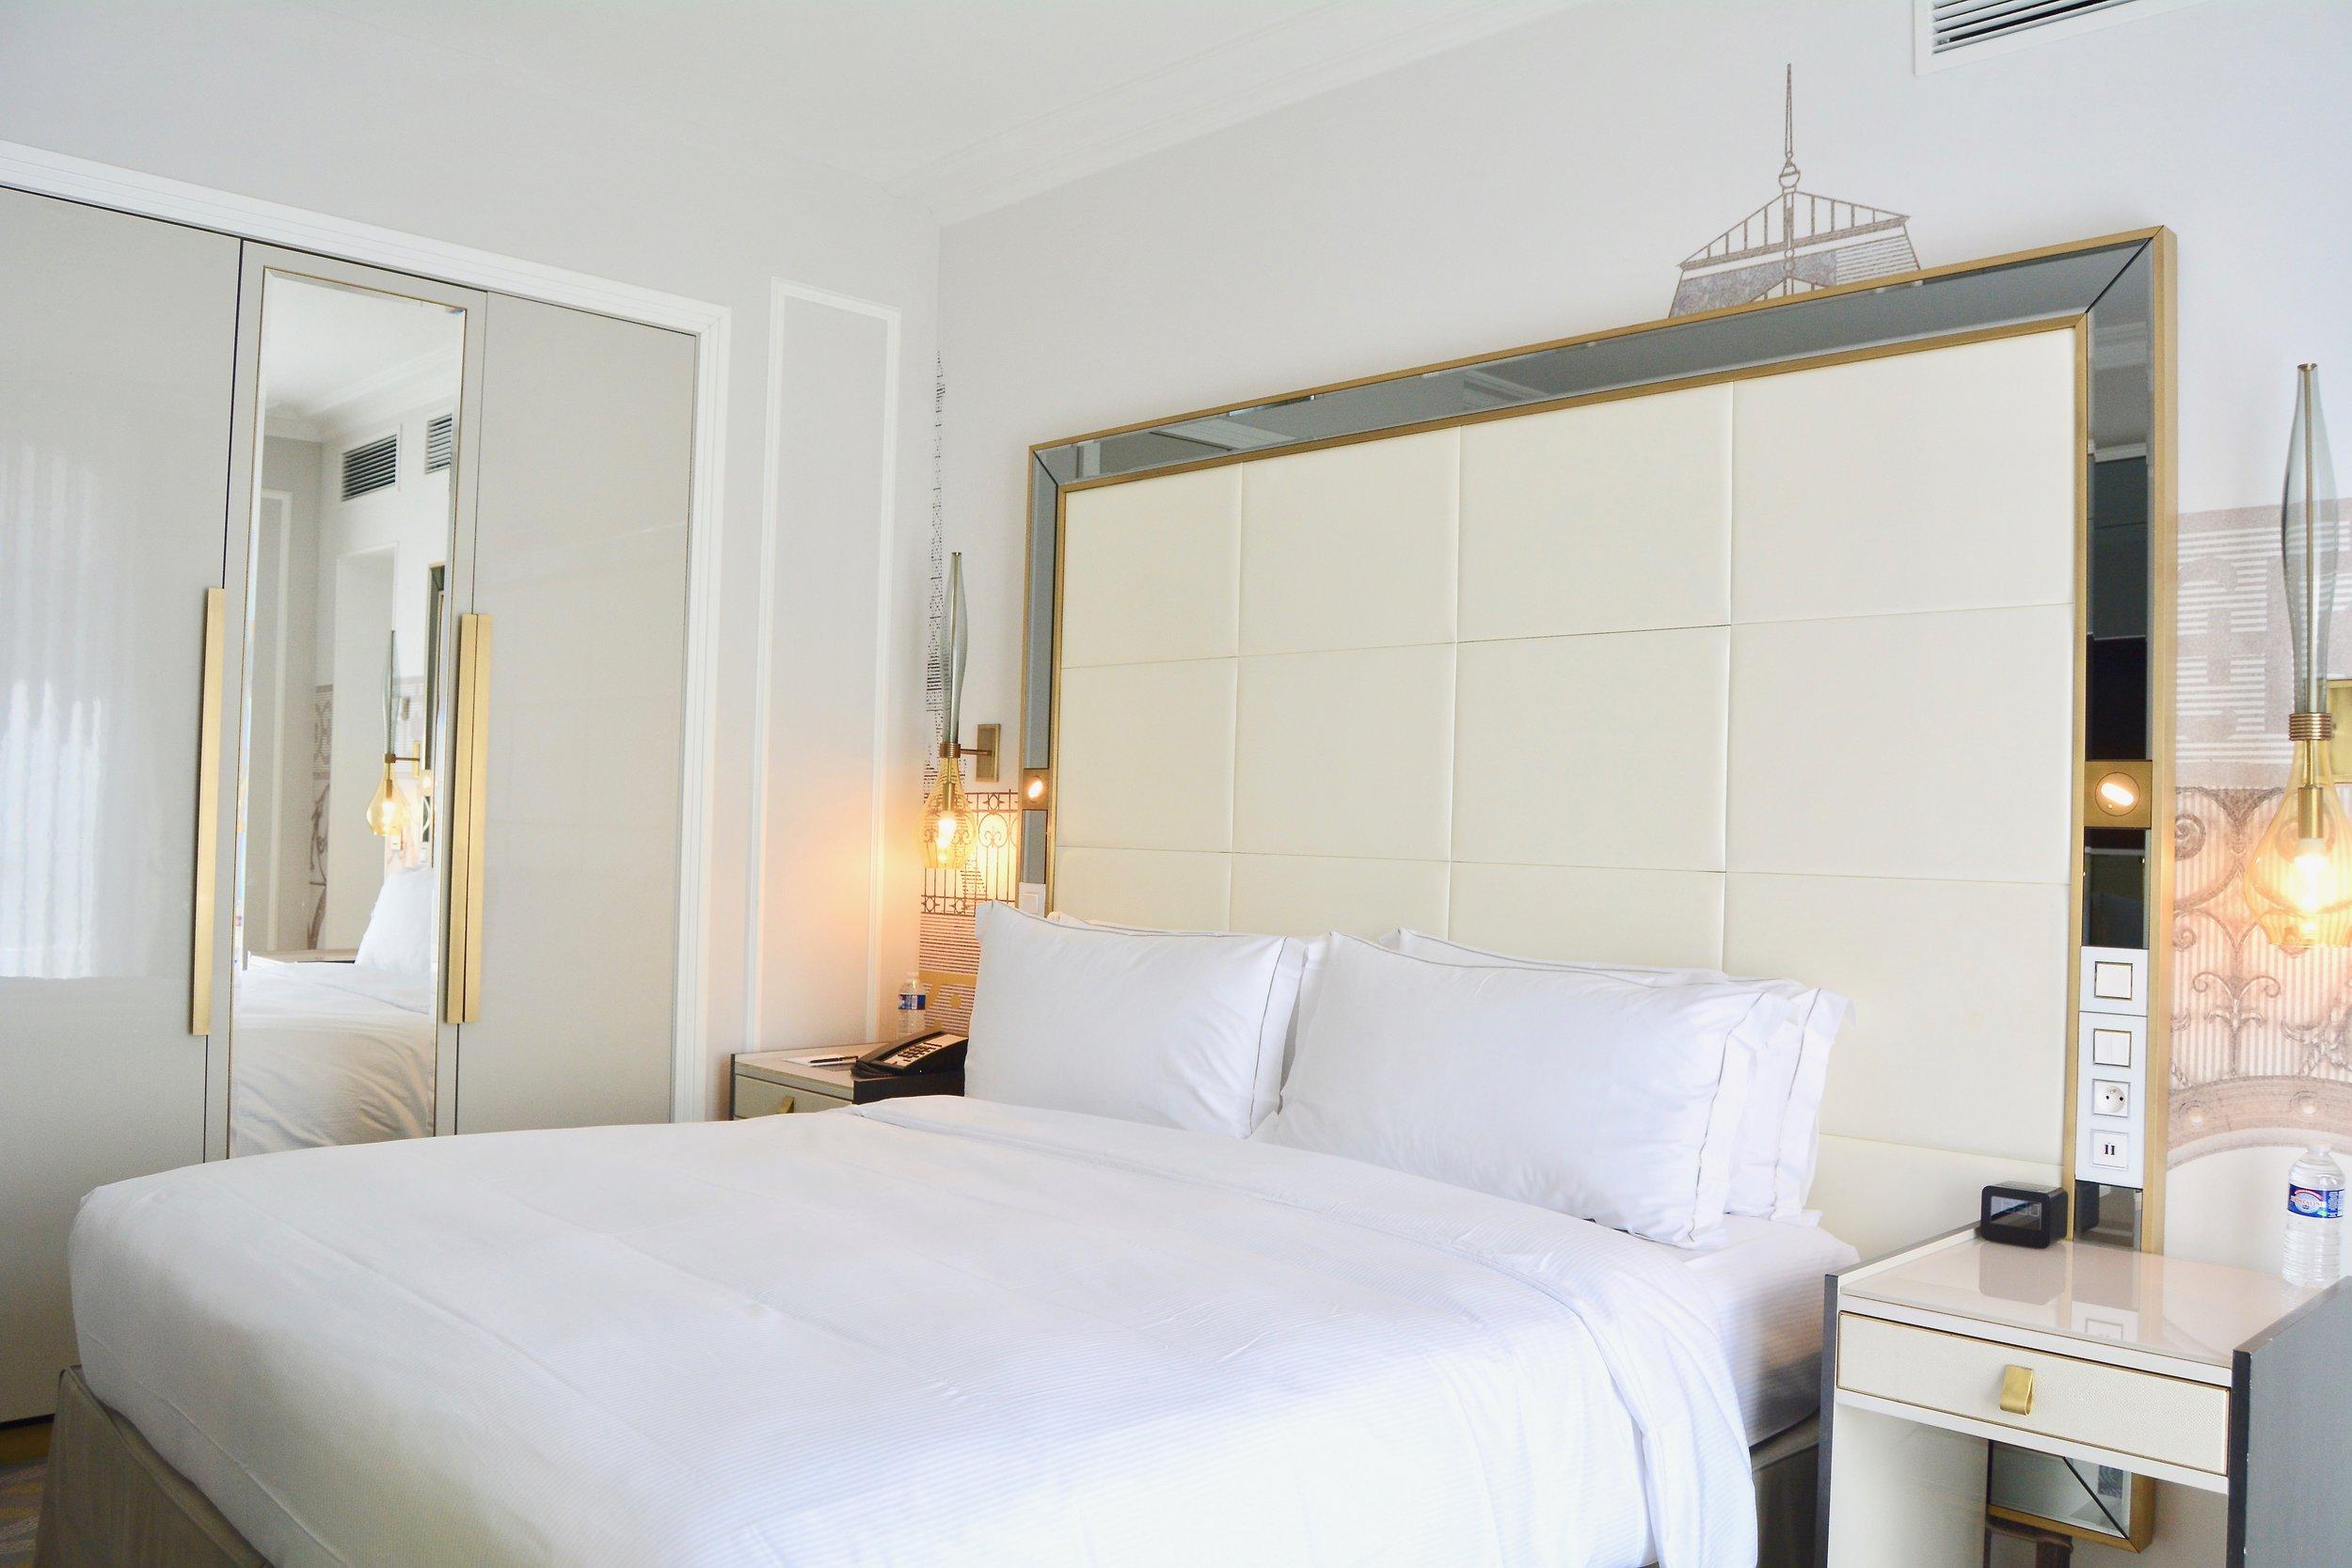 Deluxe Room (Hilton Paris Opera)